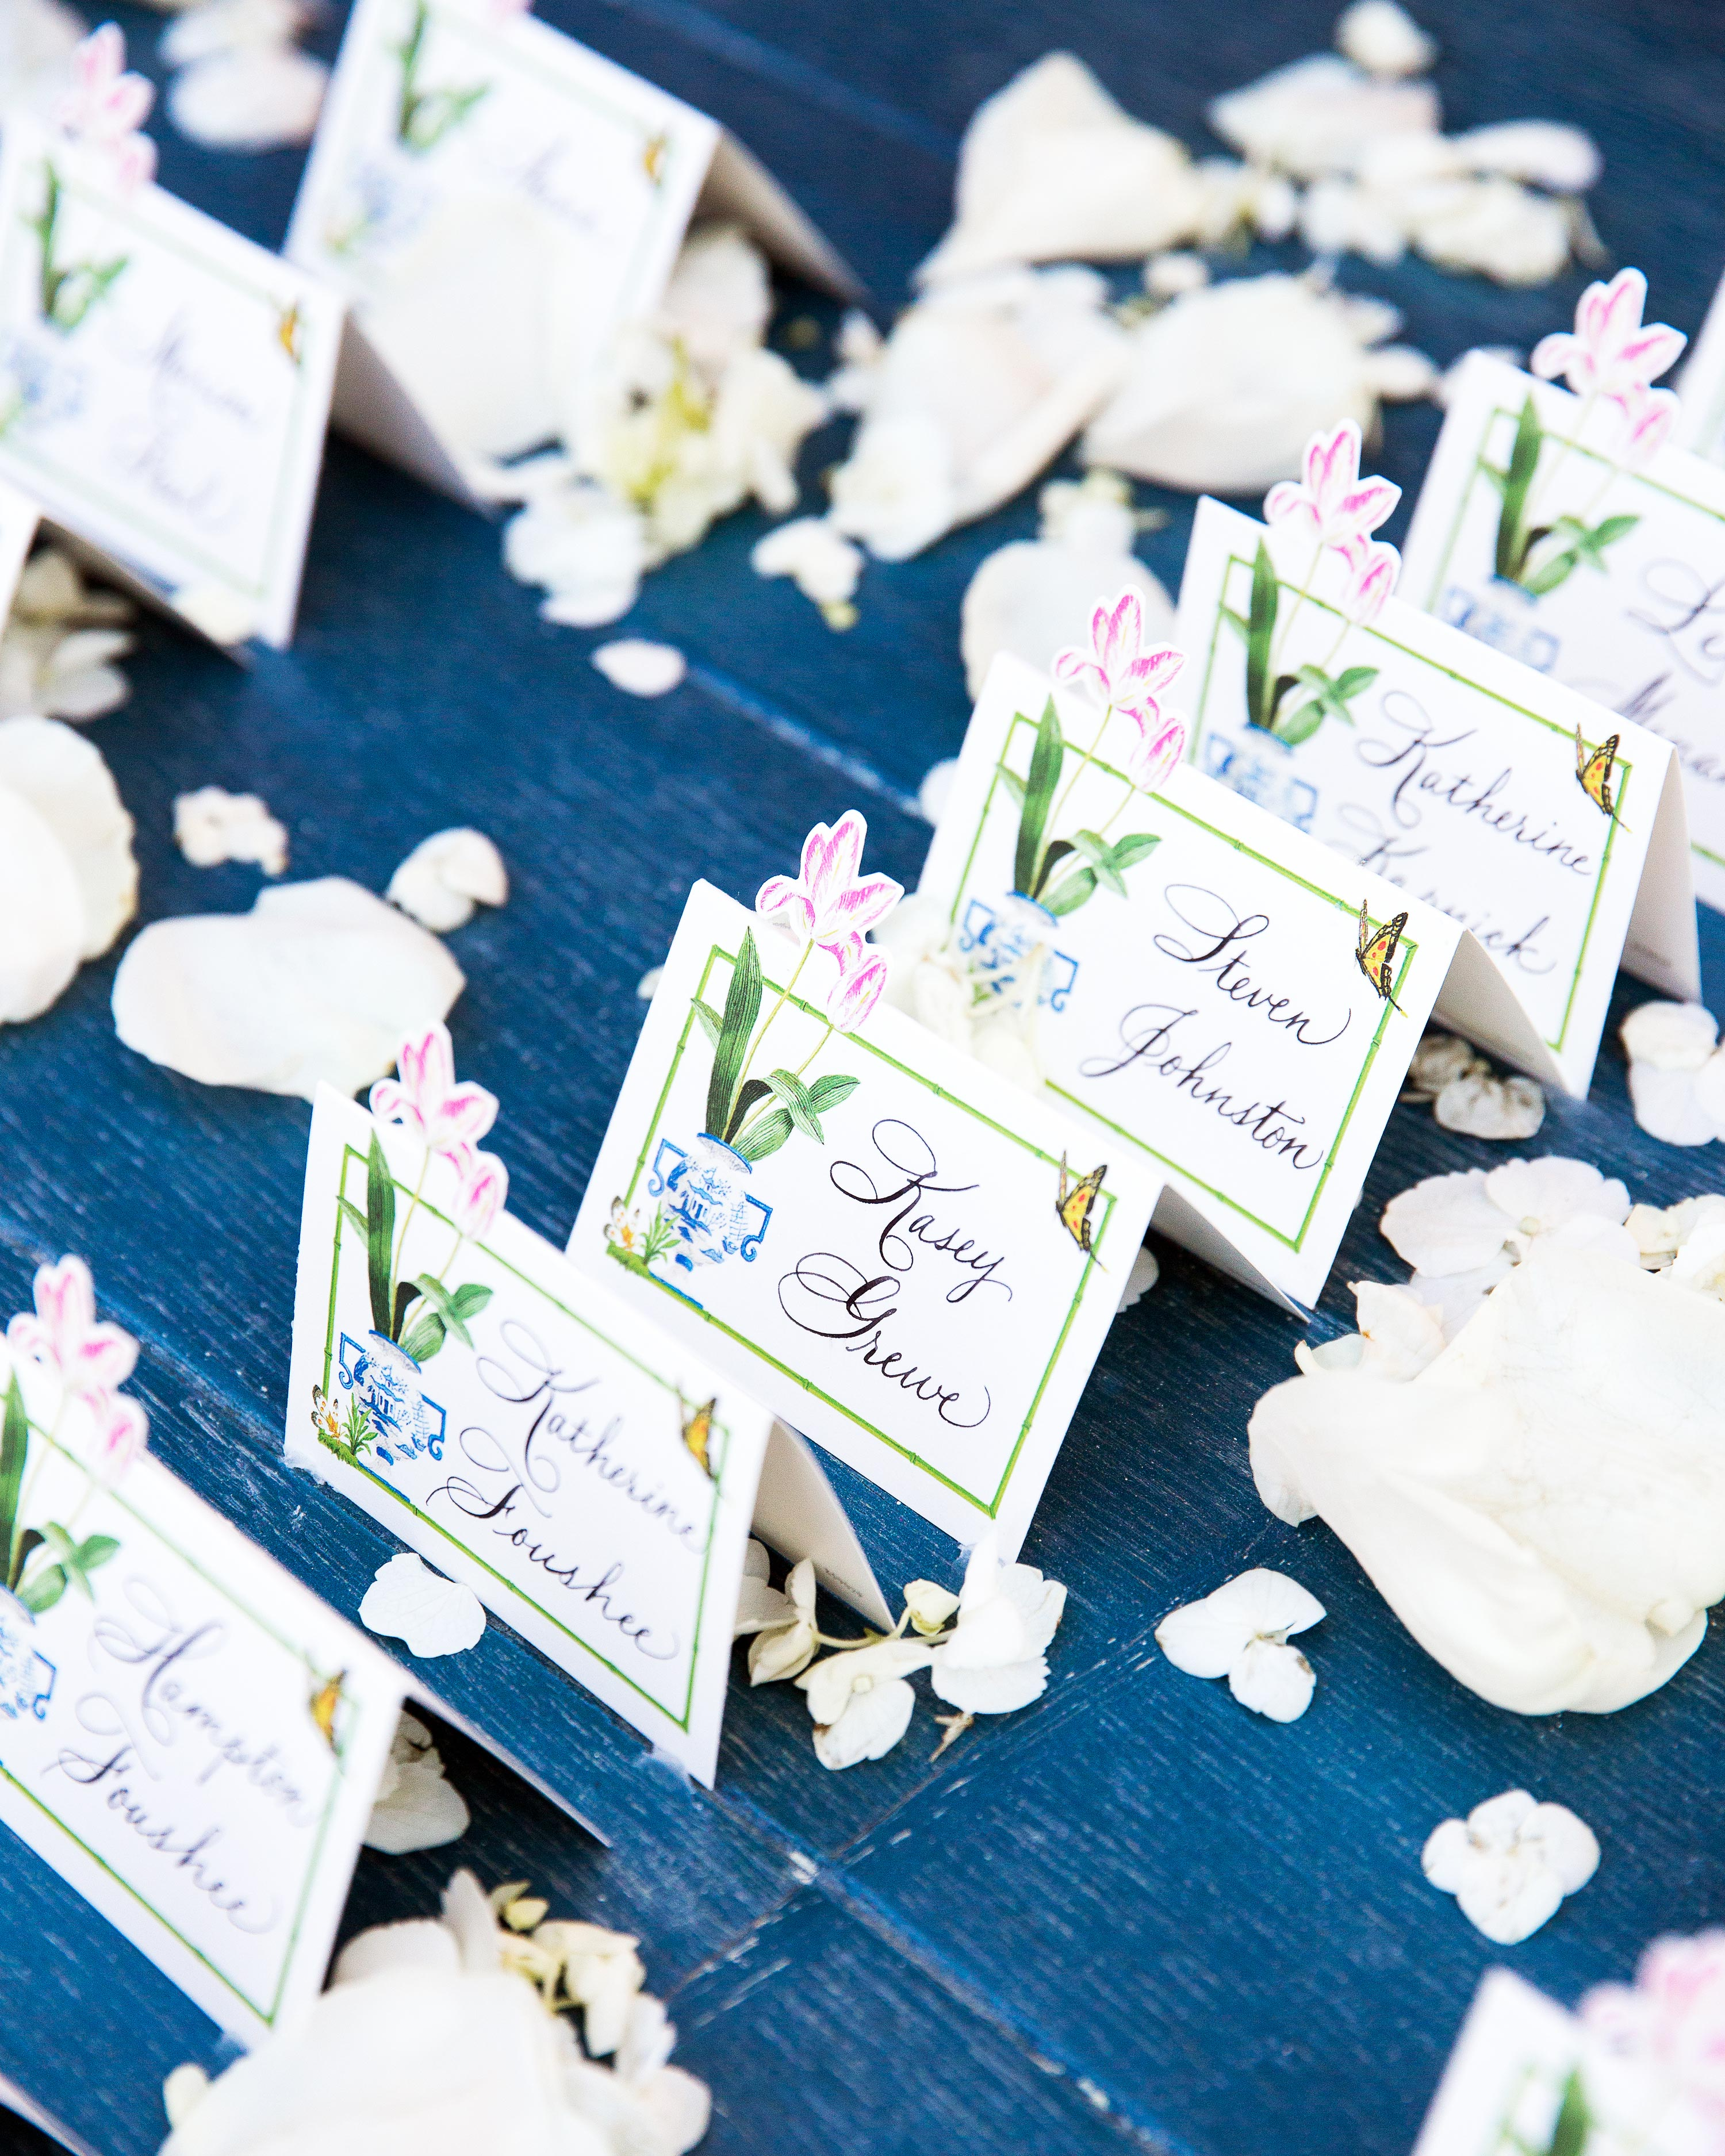 honor-jay-wedding-connecticut-escortcards-1067-d112238.jpg